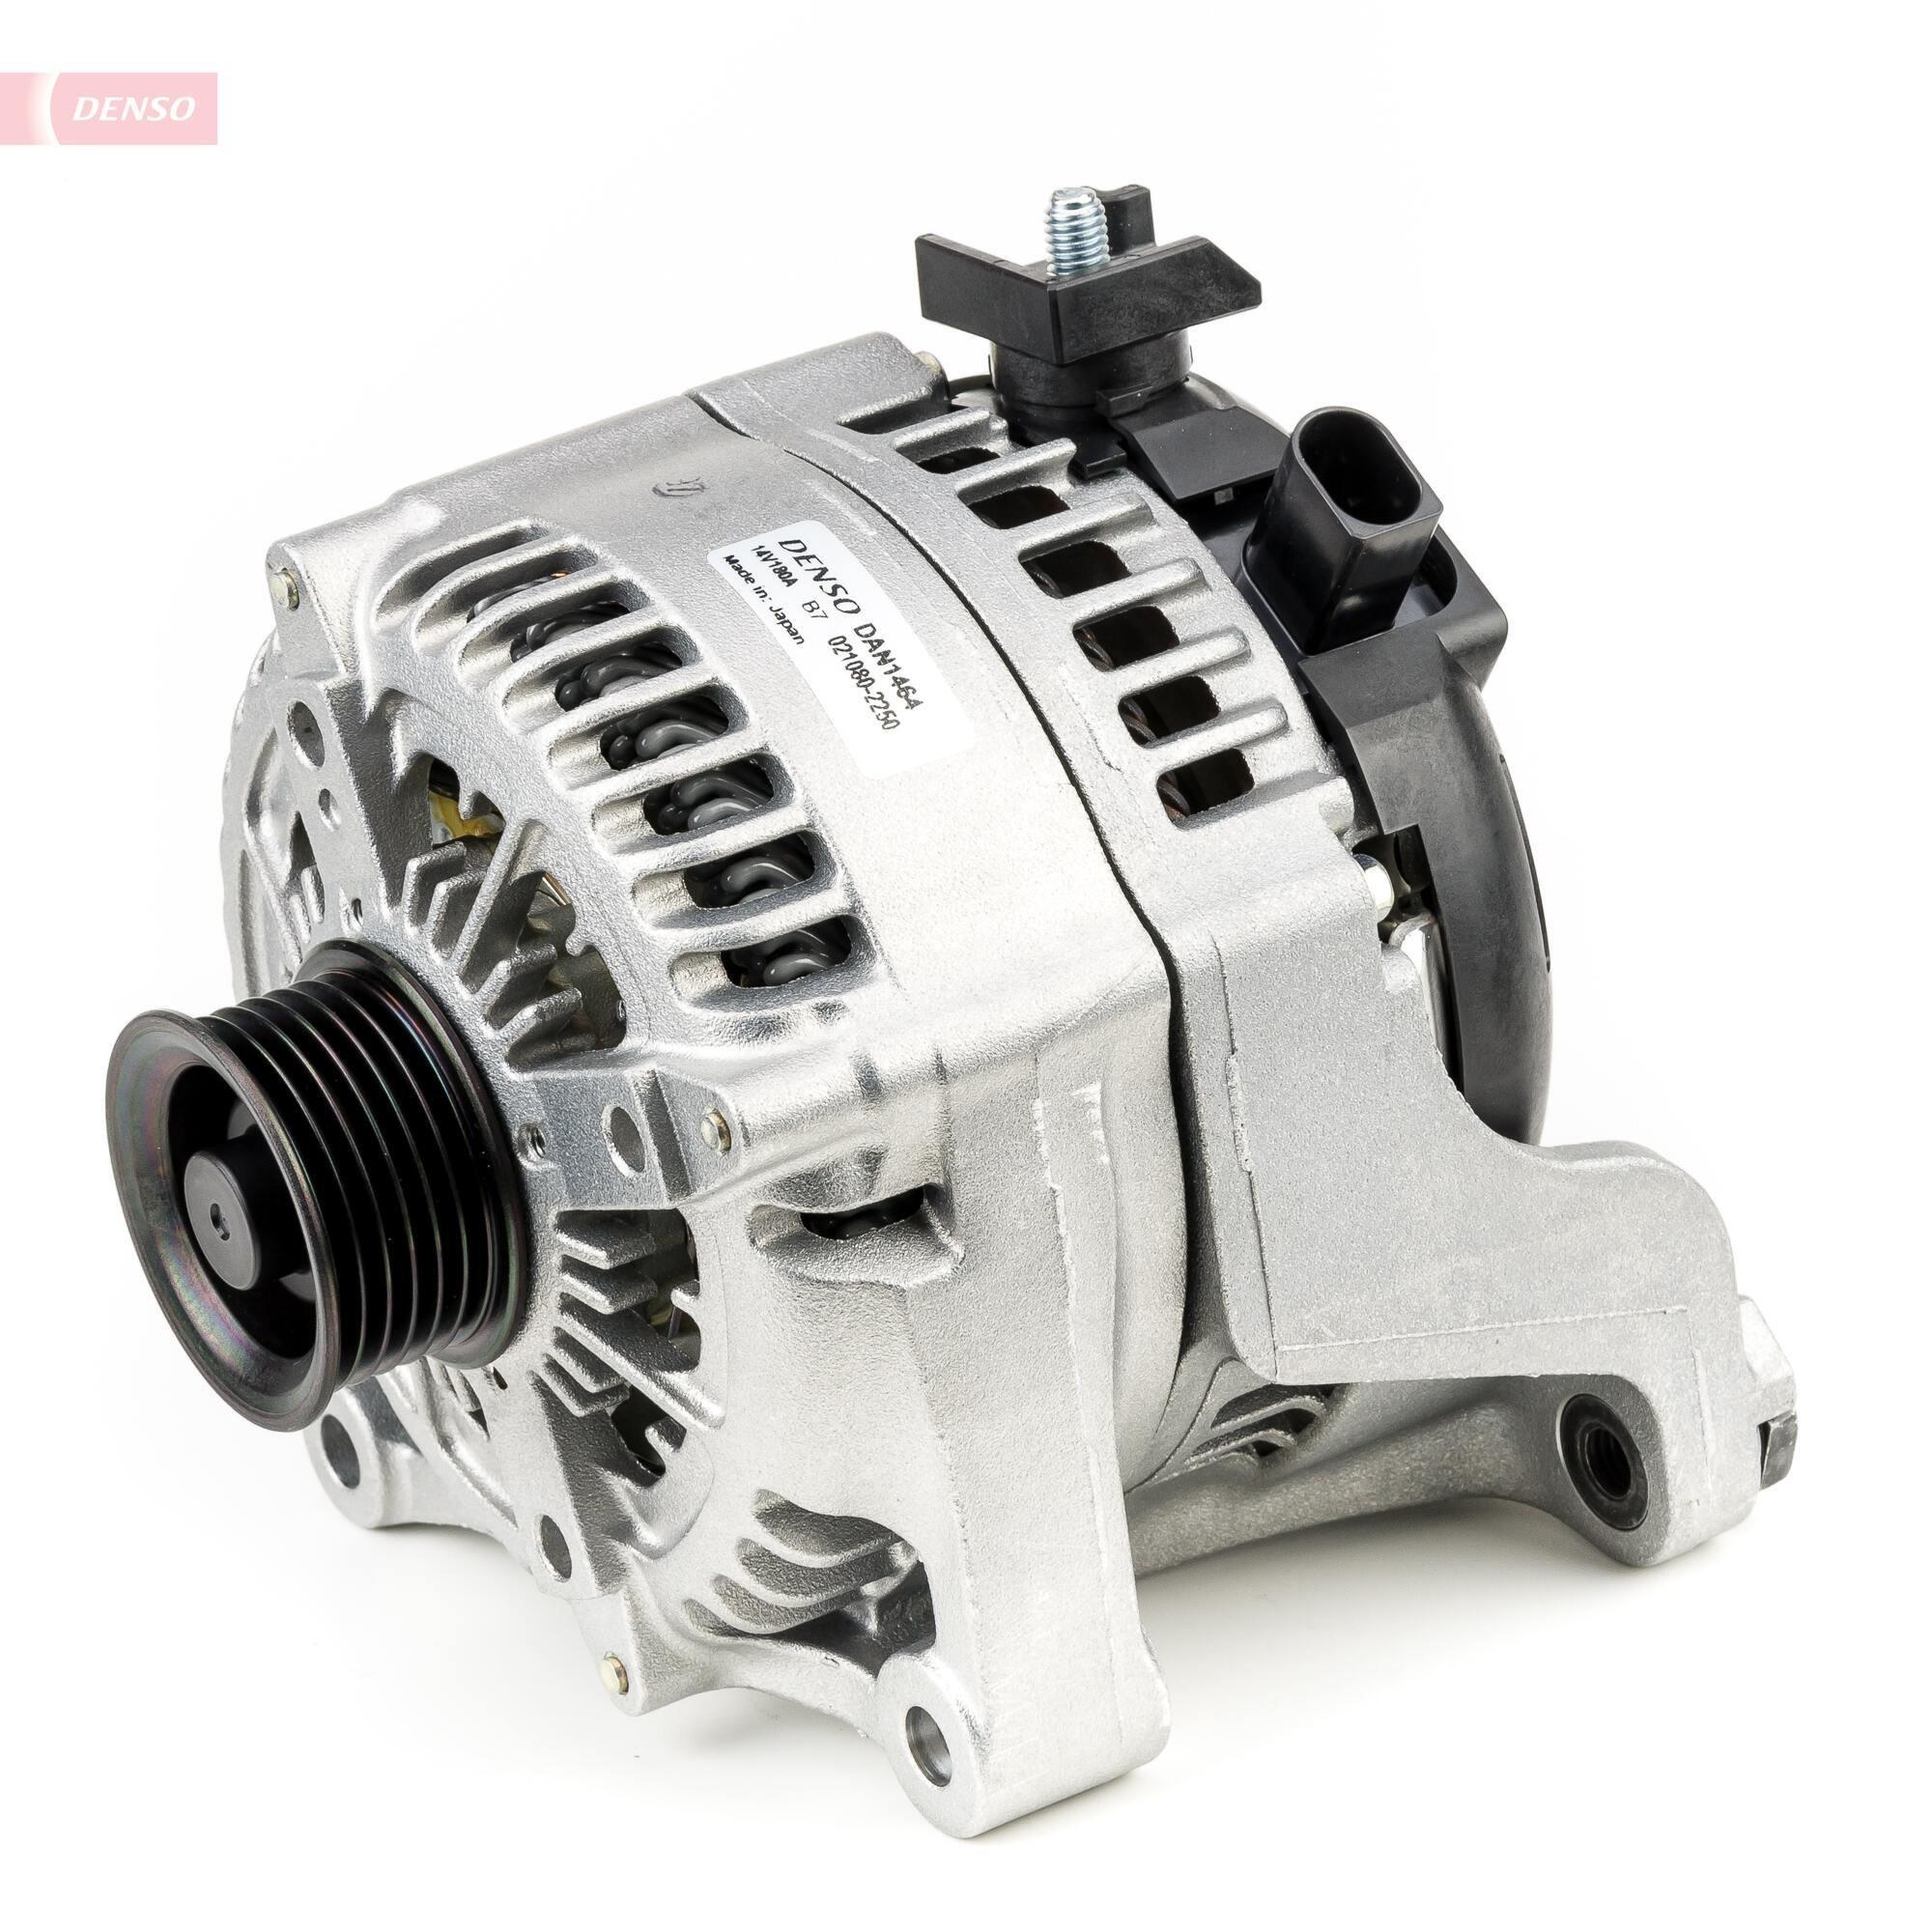 Generator DENSO DAN1464 Bild 1